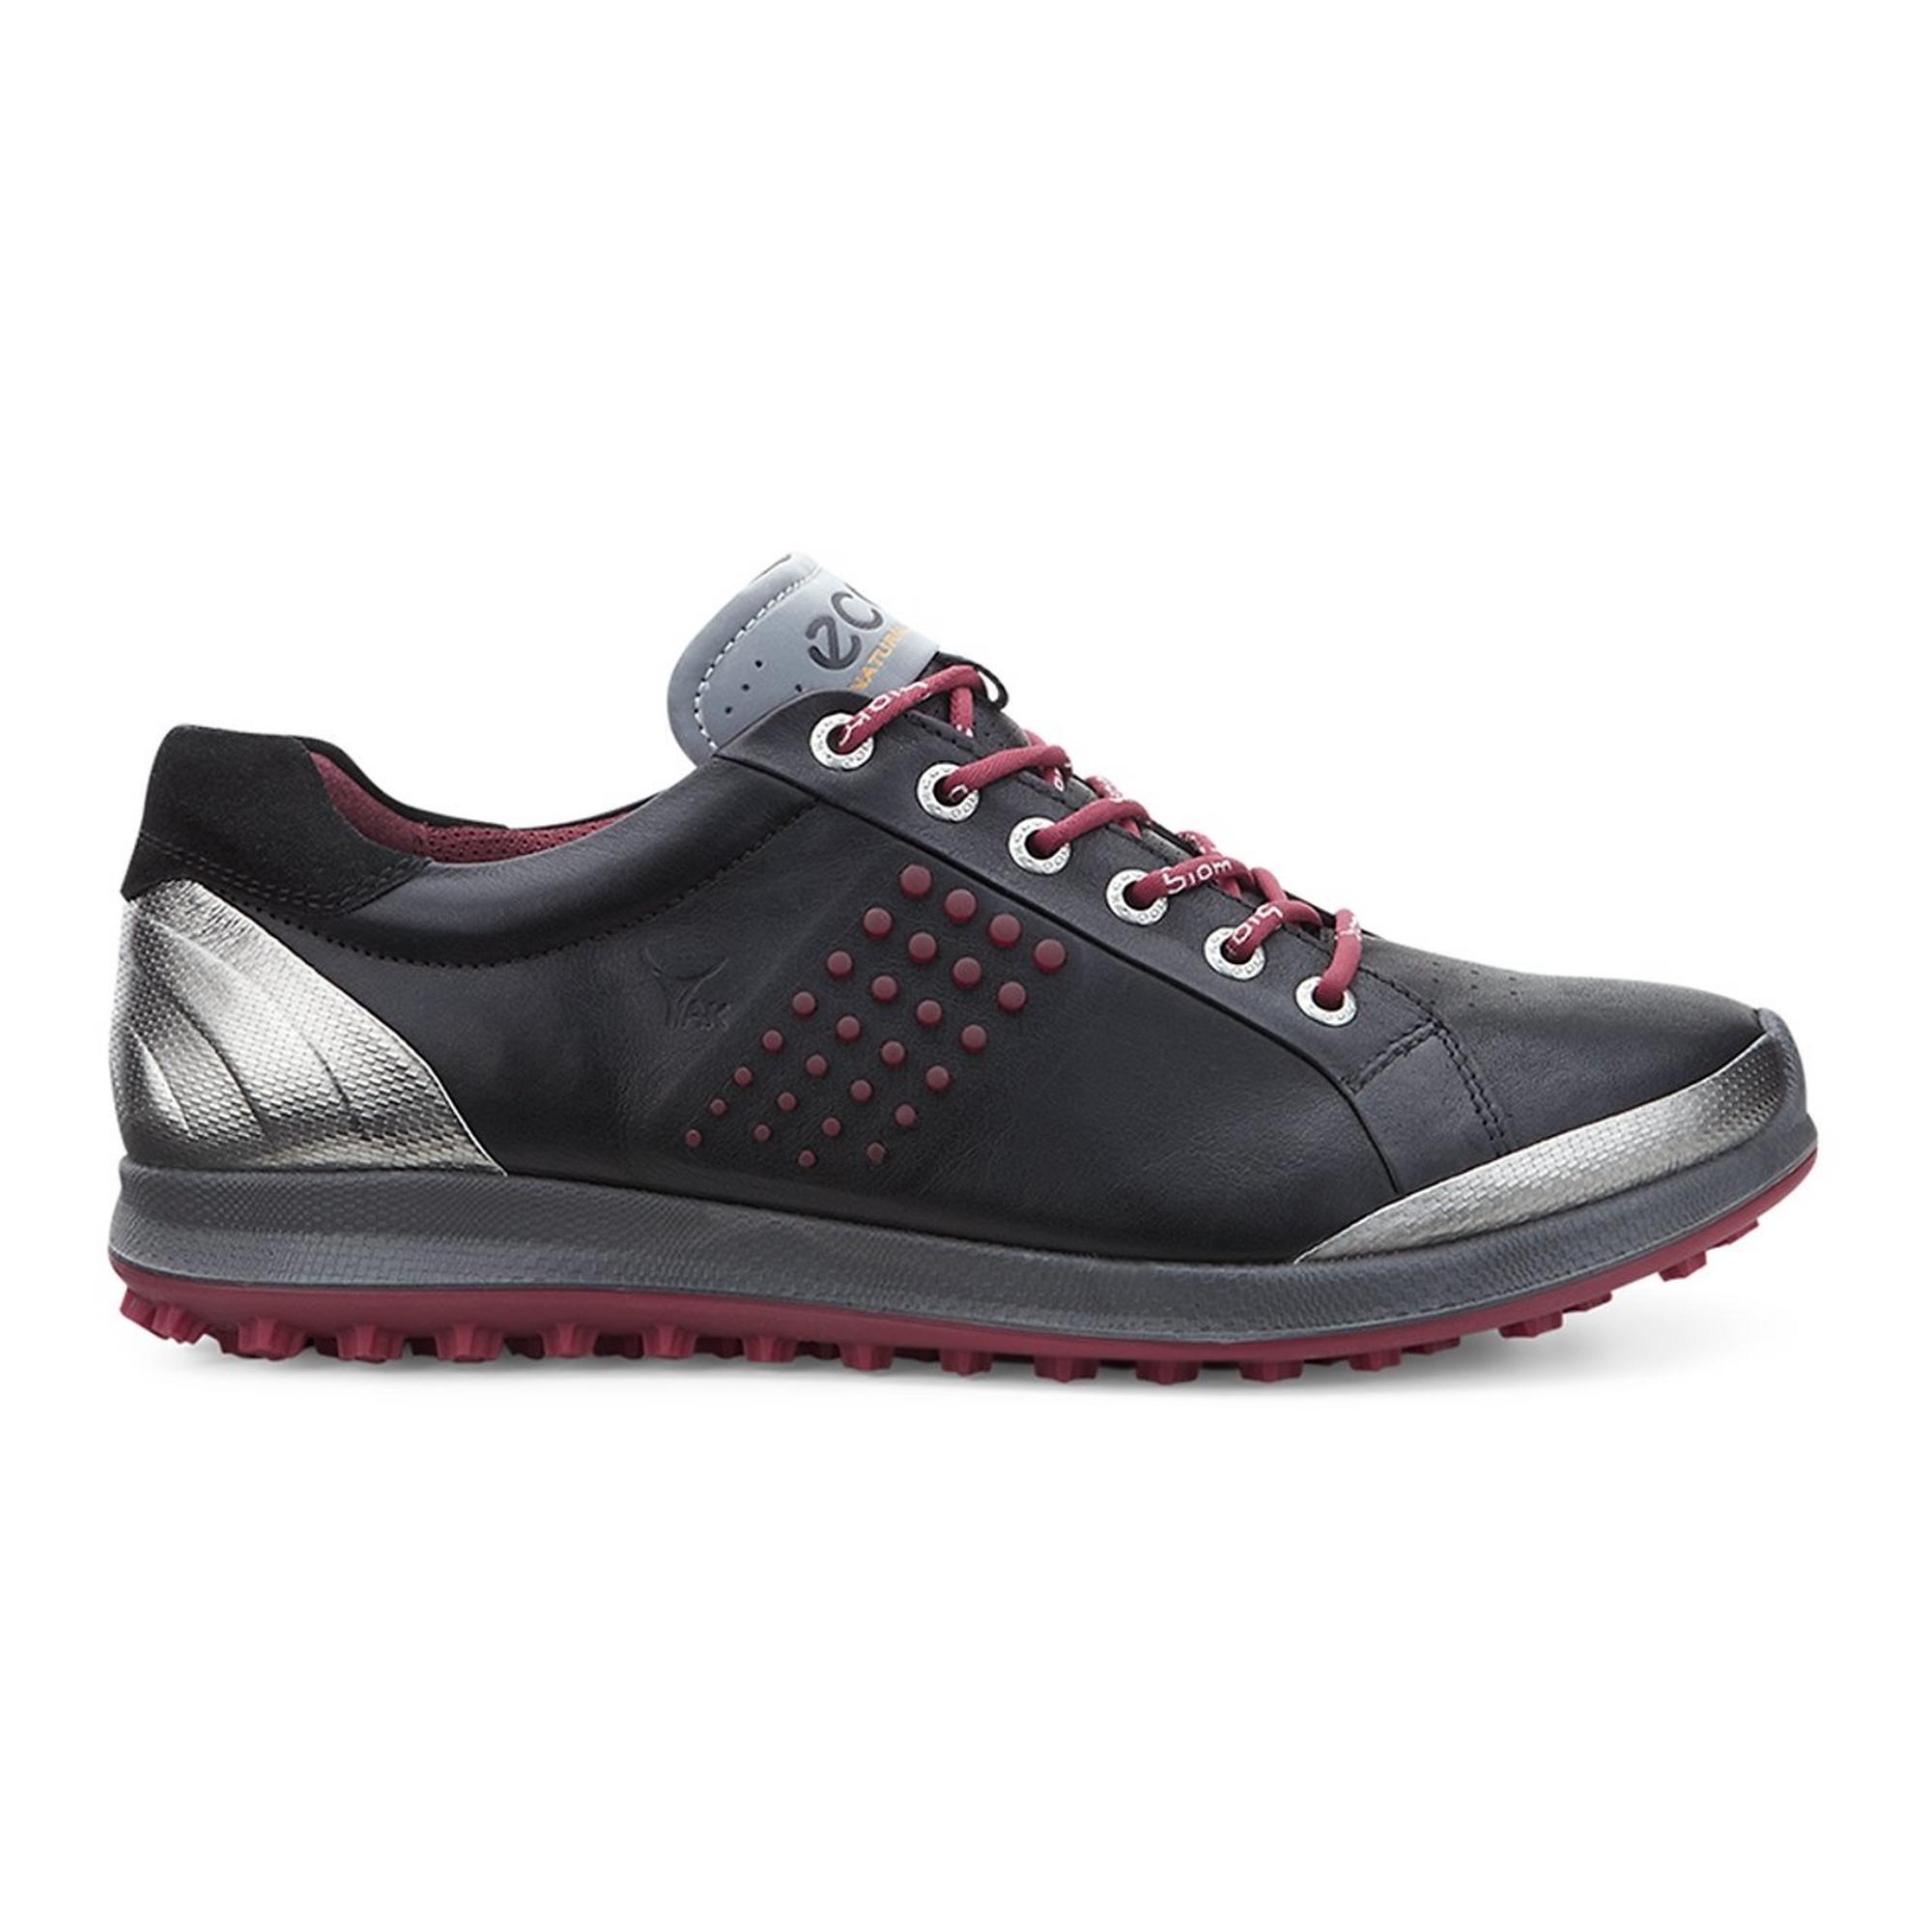 Men's Biom Hybrid 2 Spikeless Golf Shoe - Black/Red